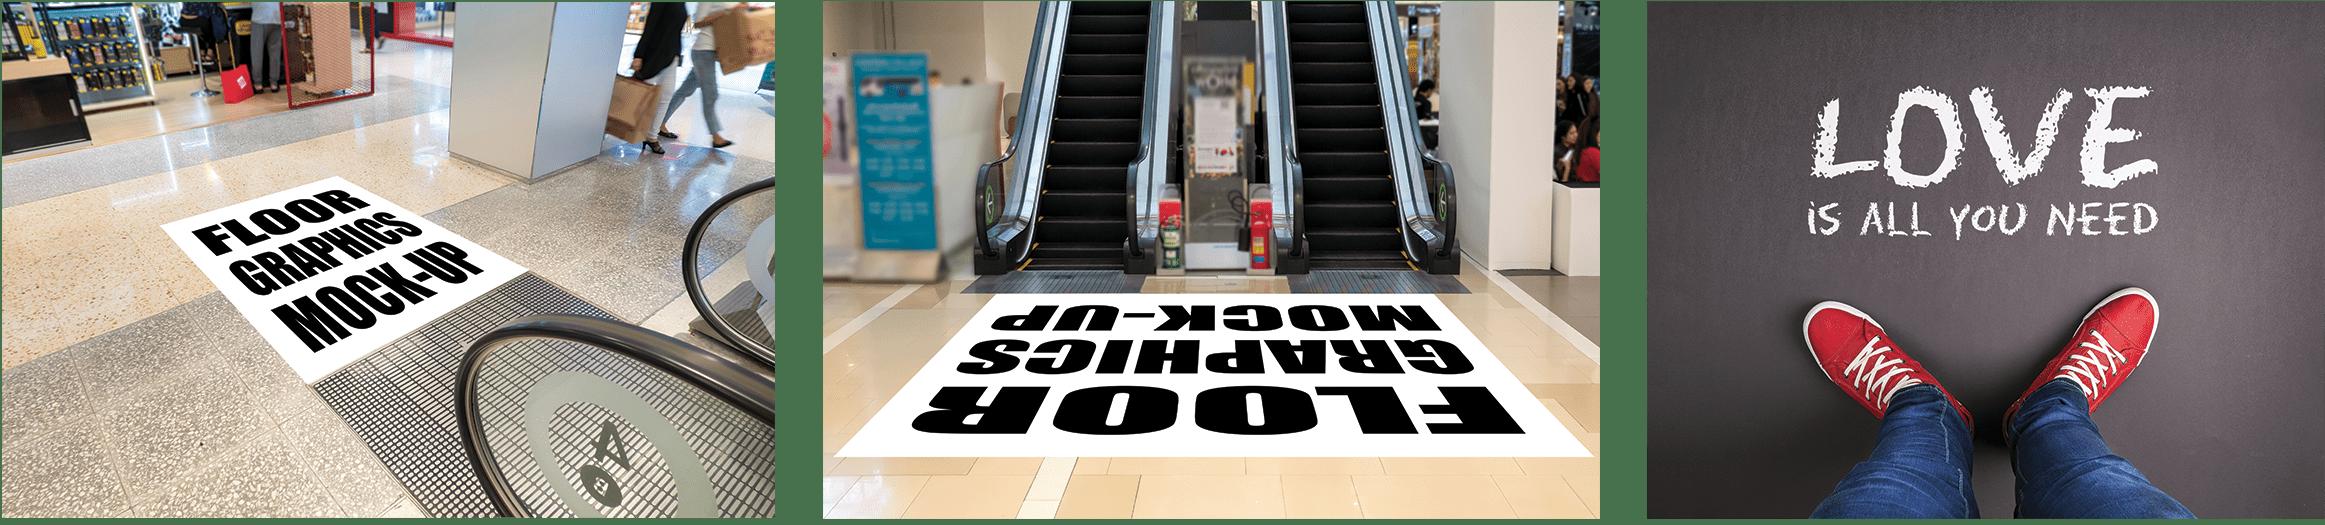 decorative floor graphics